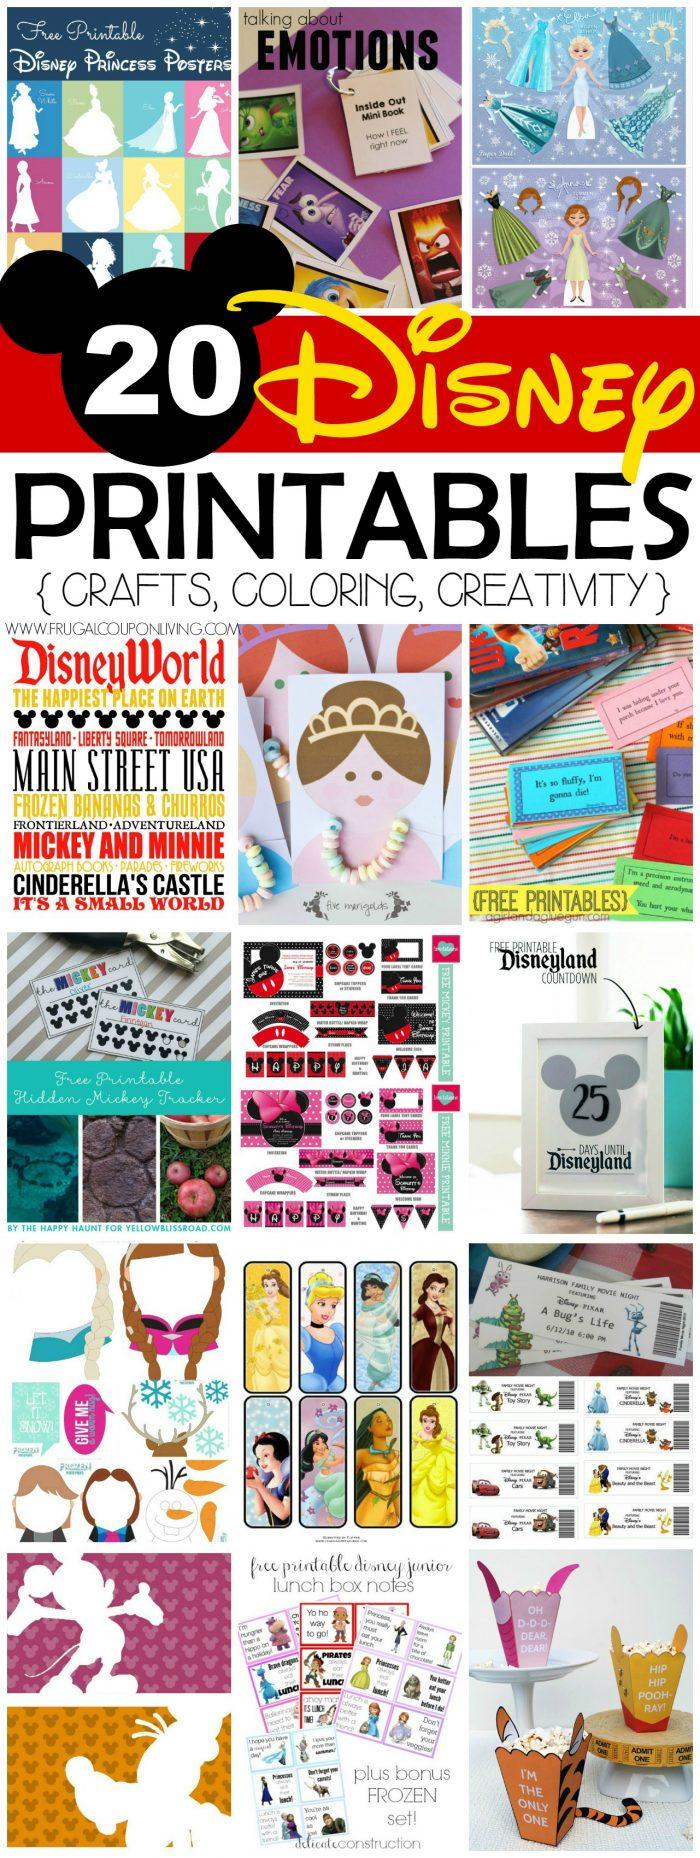 FREE Disney Printables on Frugal Coupon Living